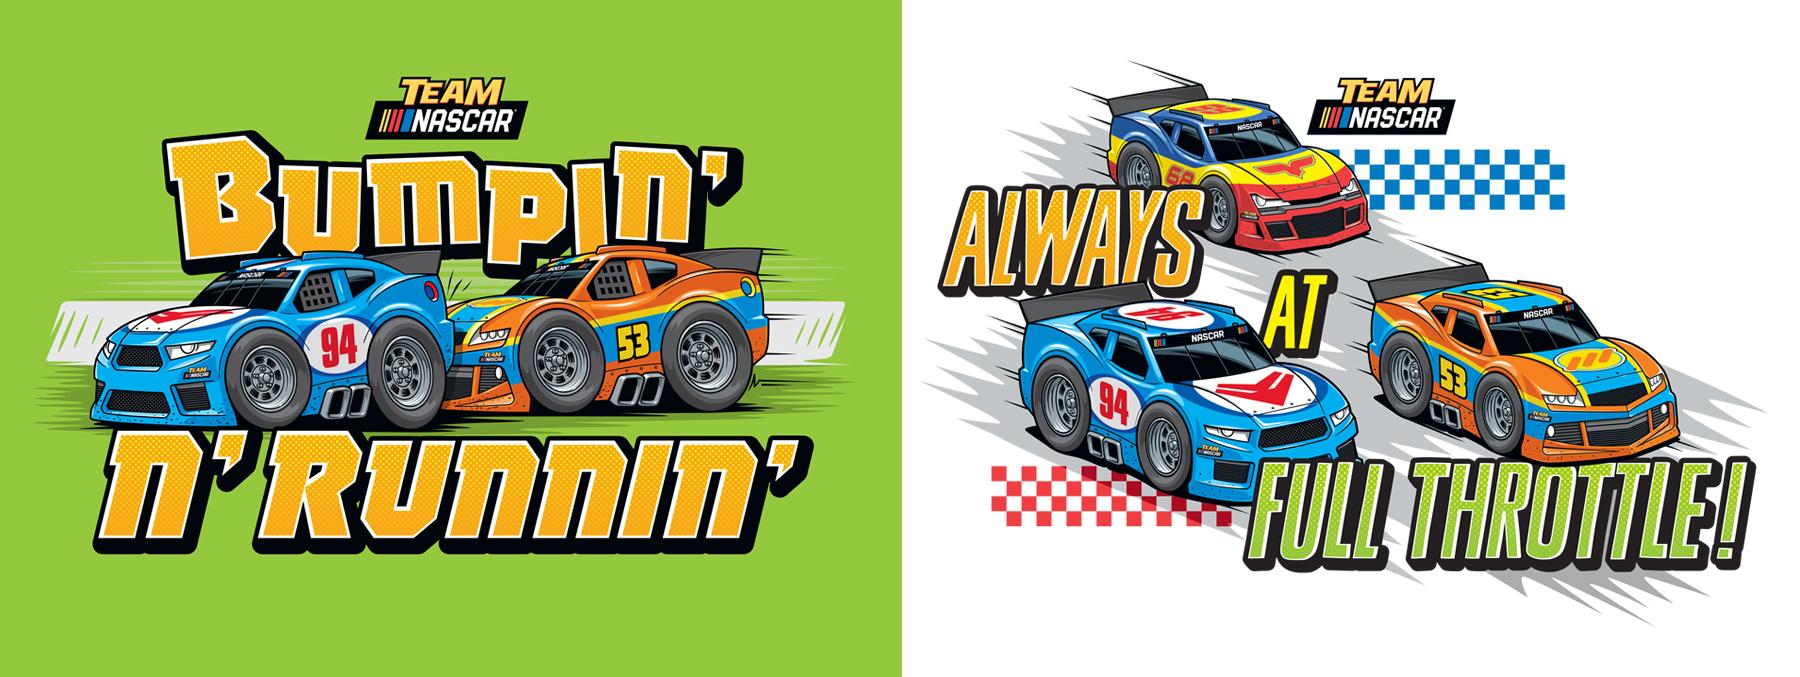 Team Nascar Style Guide Design - Bumpin' N' Runnnin'